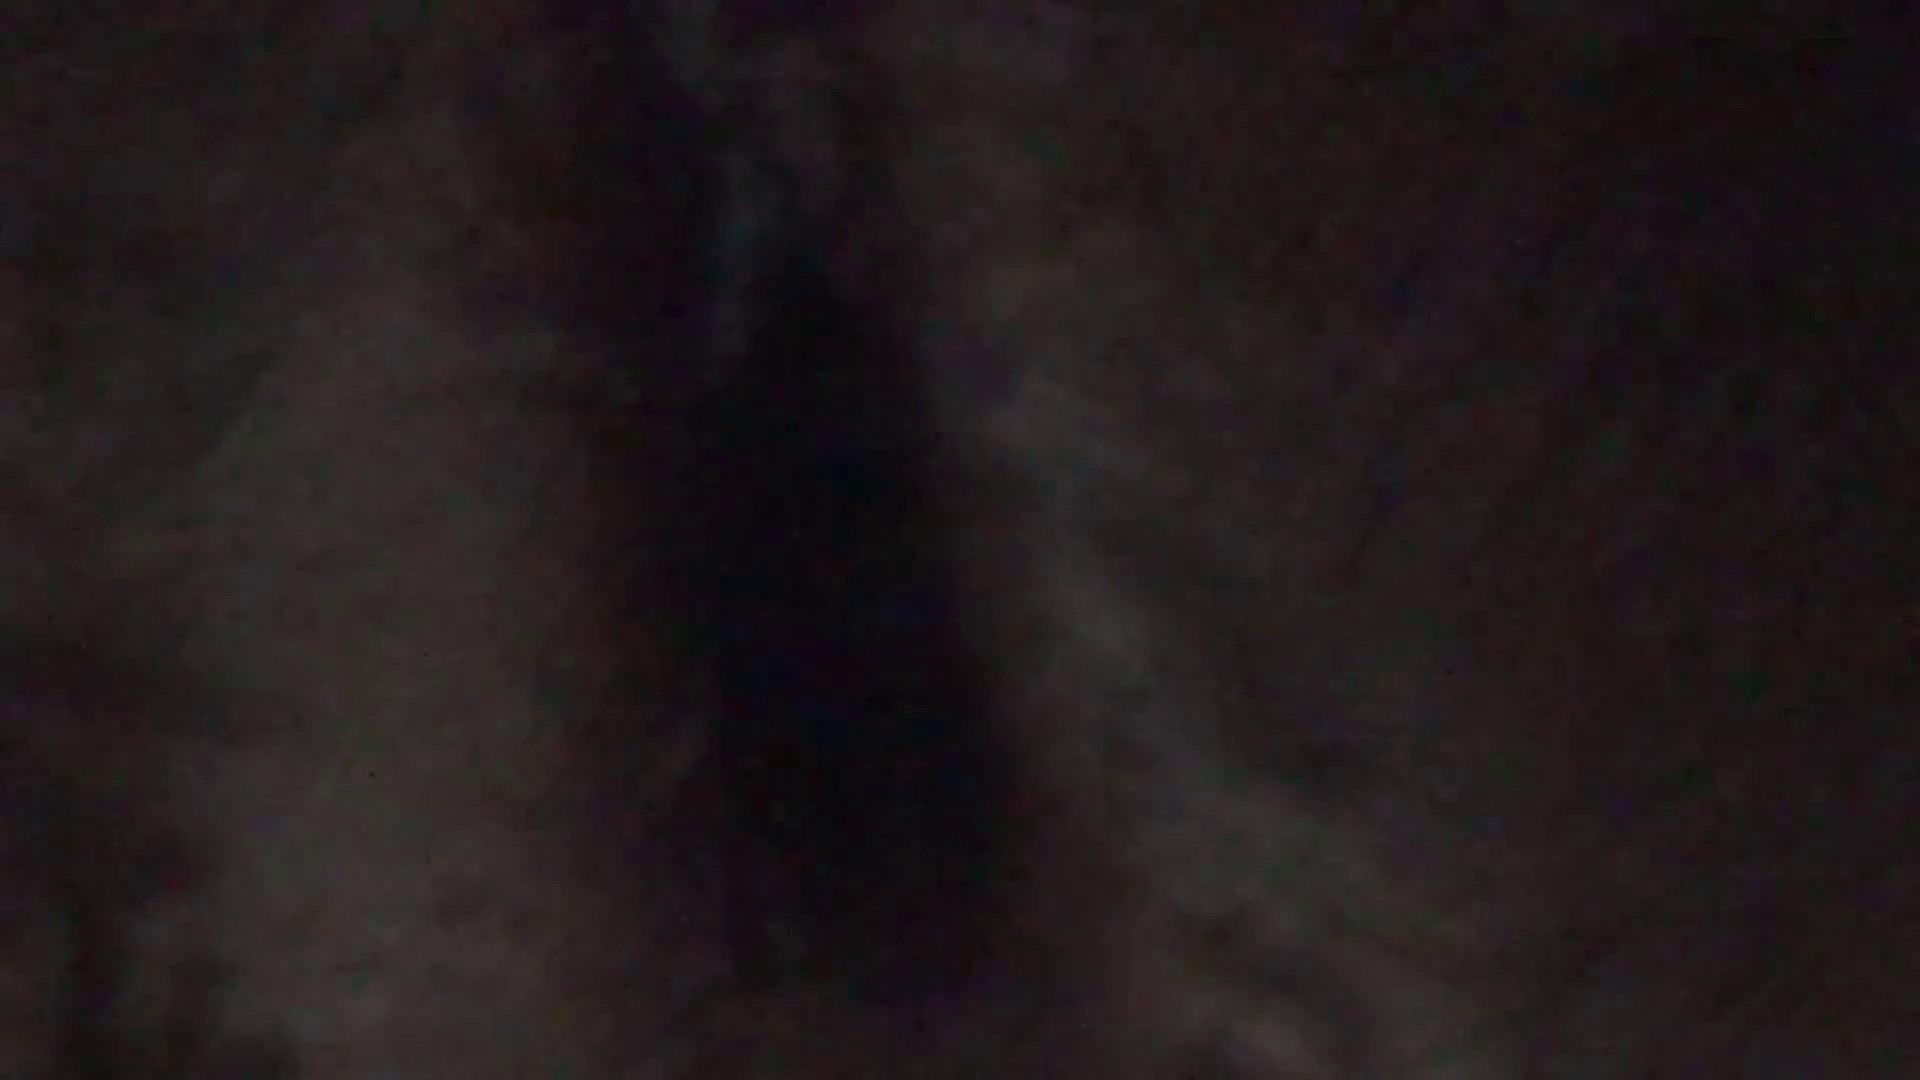 JD盗撮 美女の洗面所の秘密 Vol.44 トイレ AV無料動画キャプチャ 98pic 34